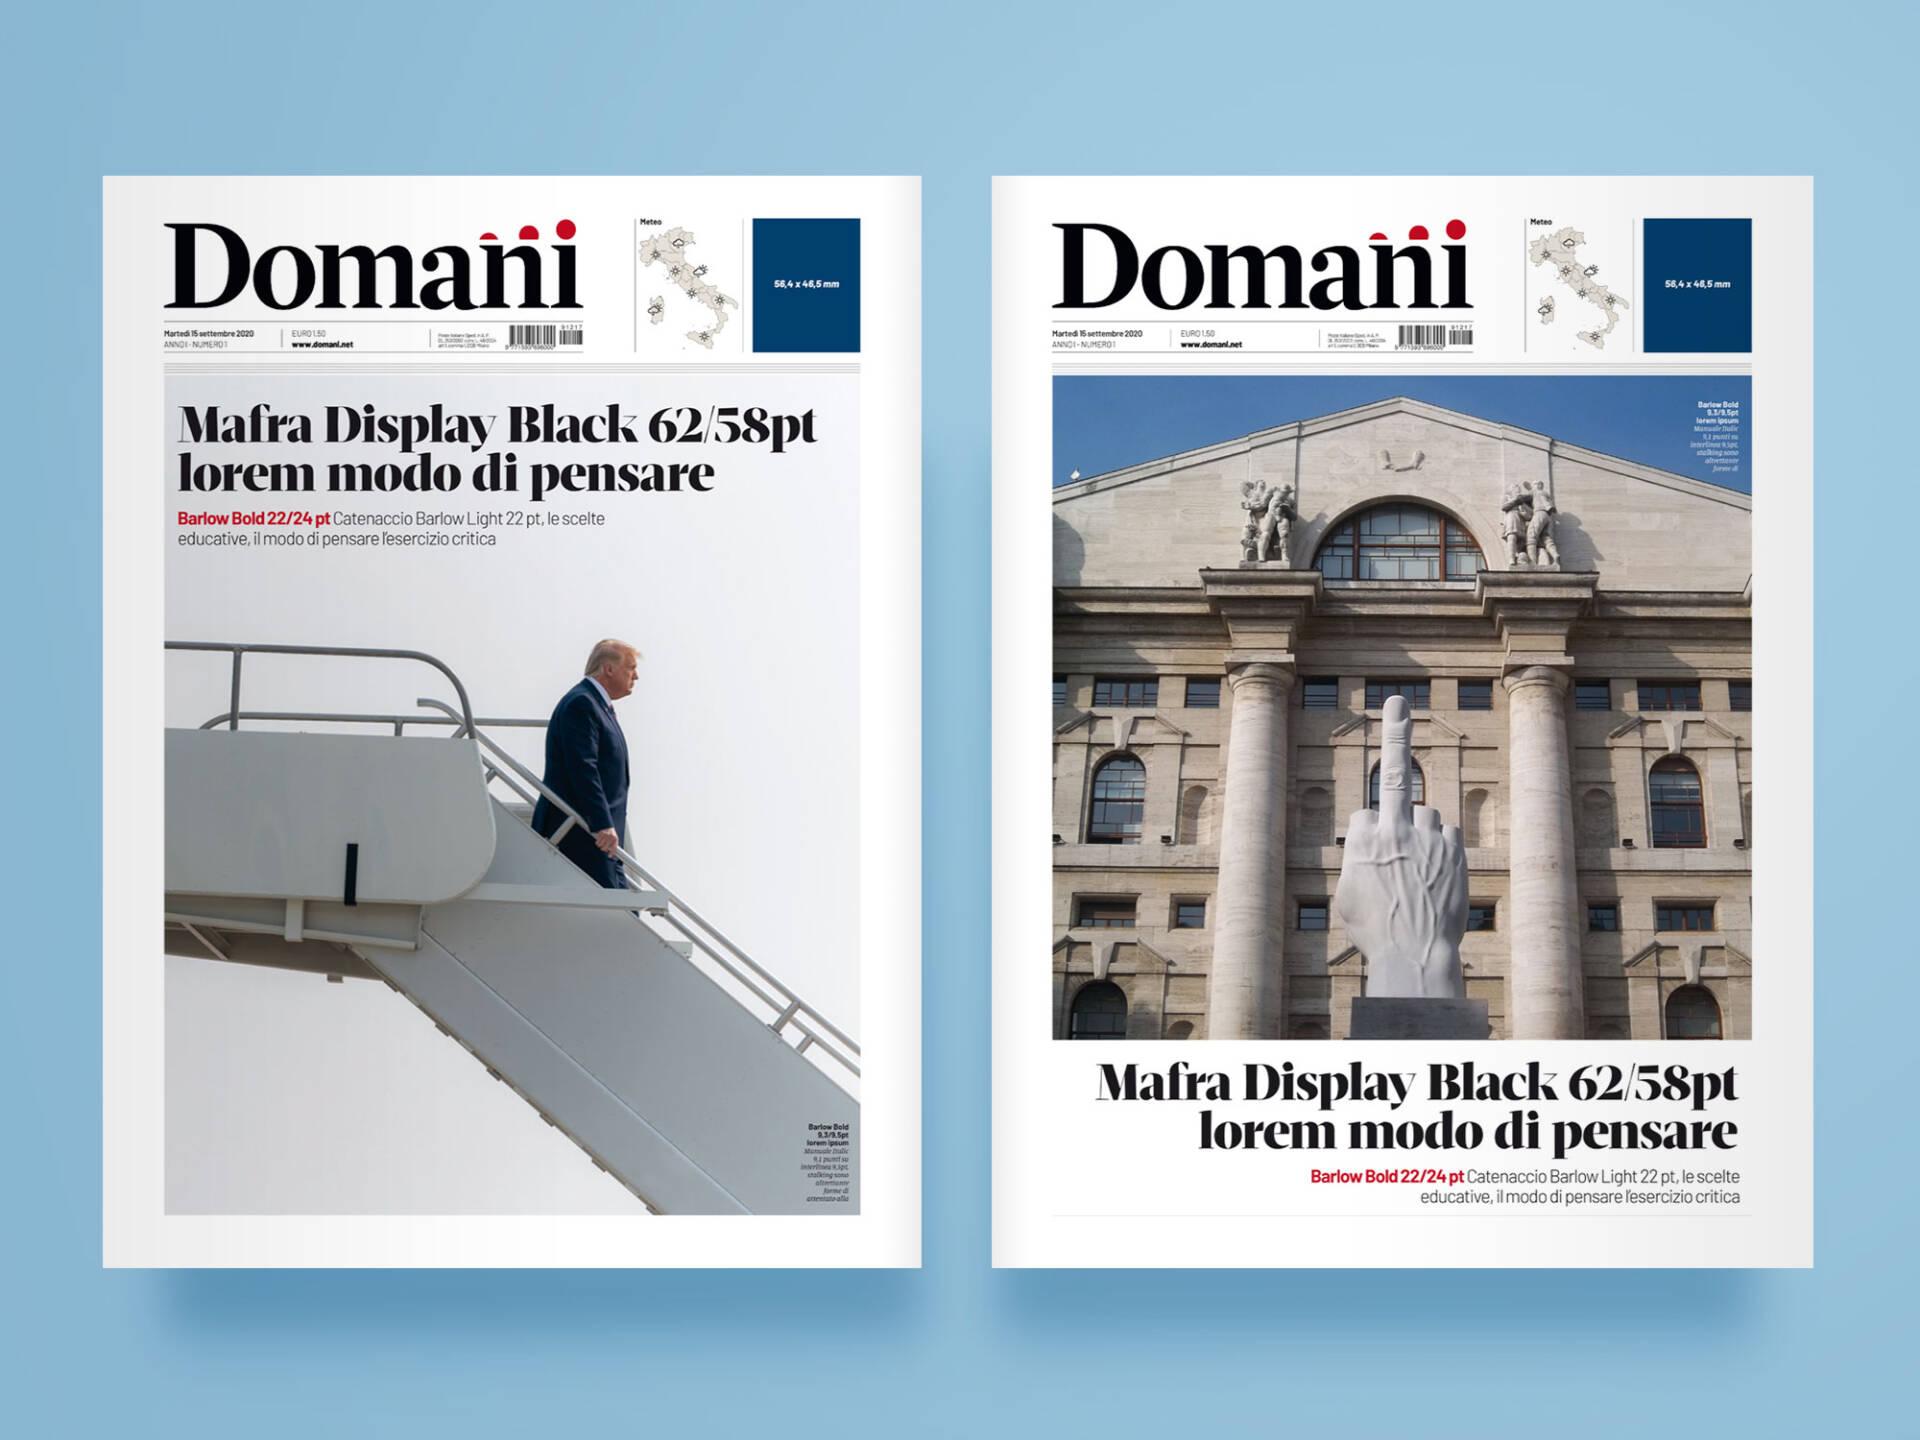 Domani_Print_Frontpage_Wenceslau_News_Design03